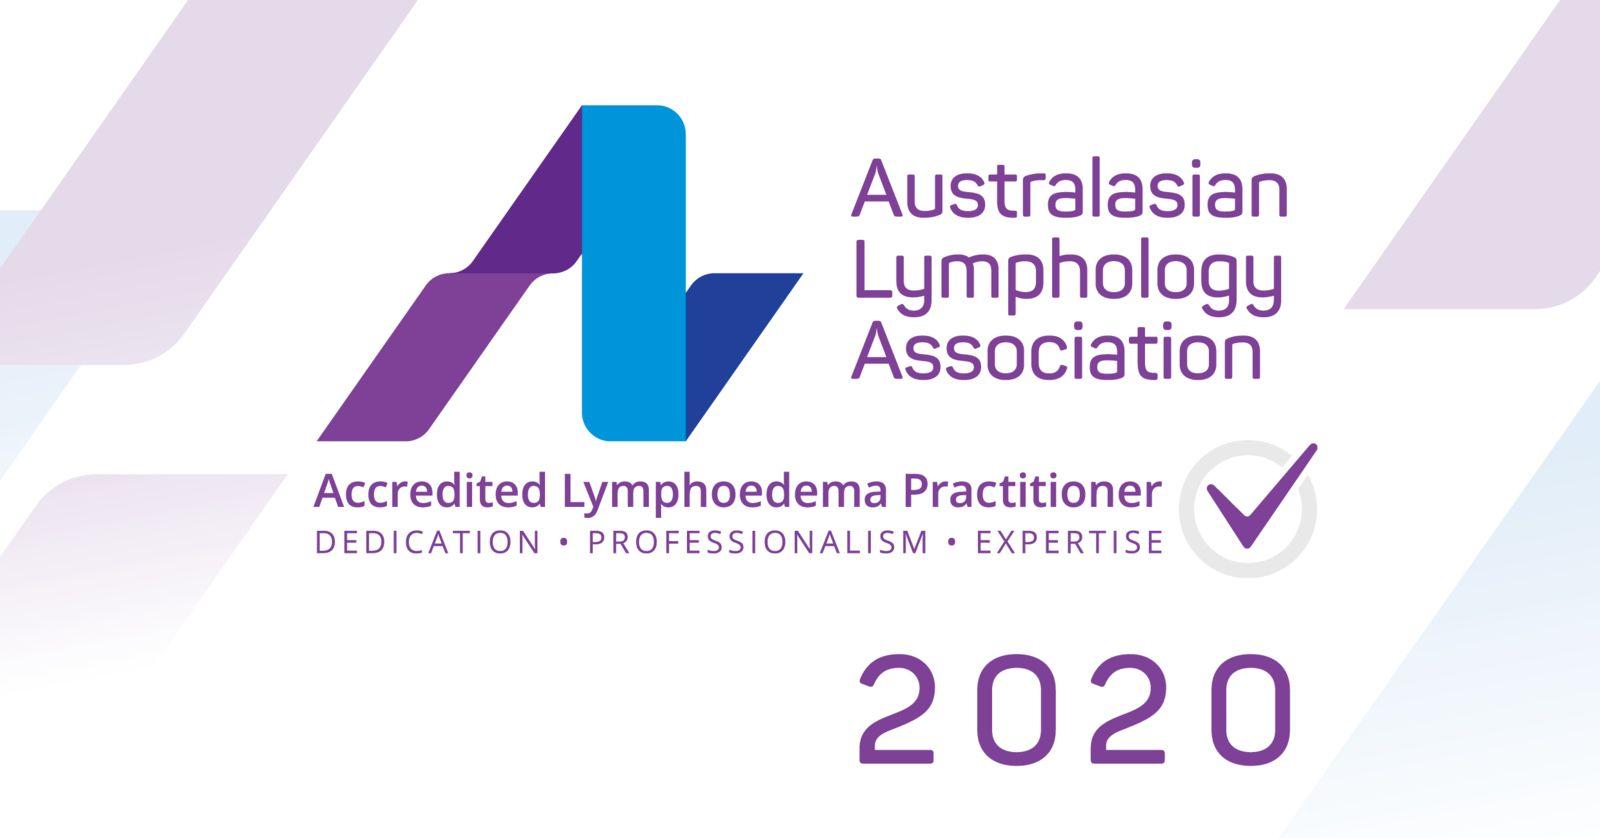 Accredited-Lymphoedema-Practitioner-ALA-massageyeah